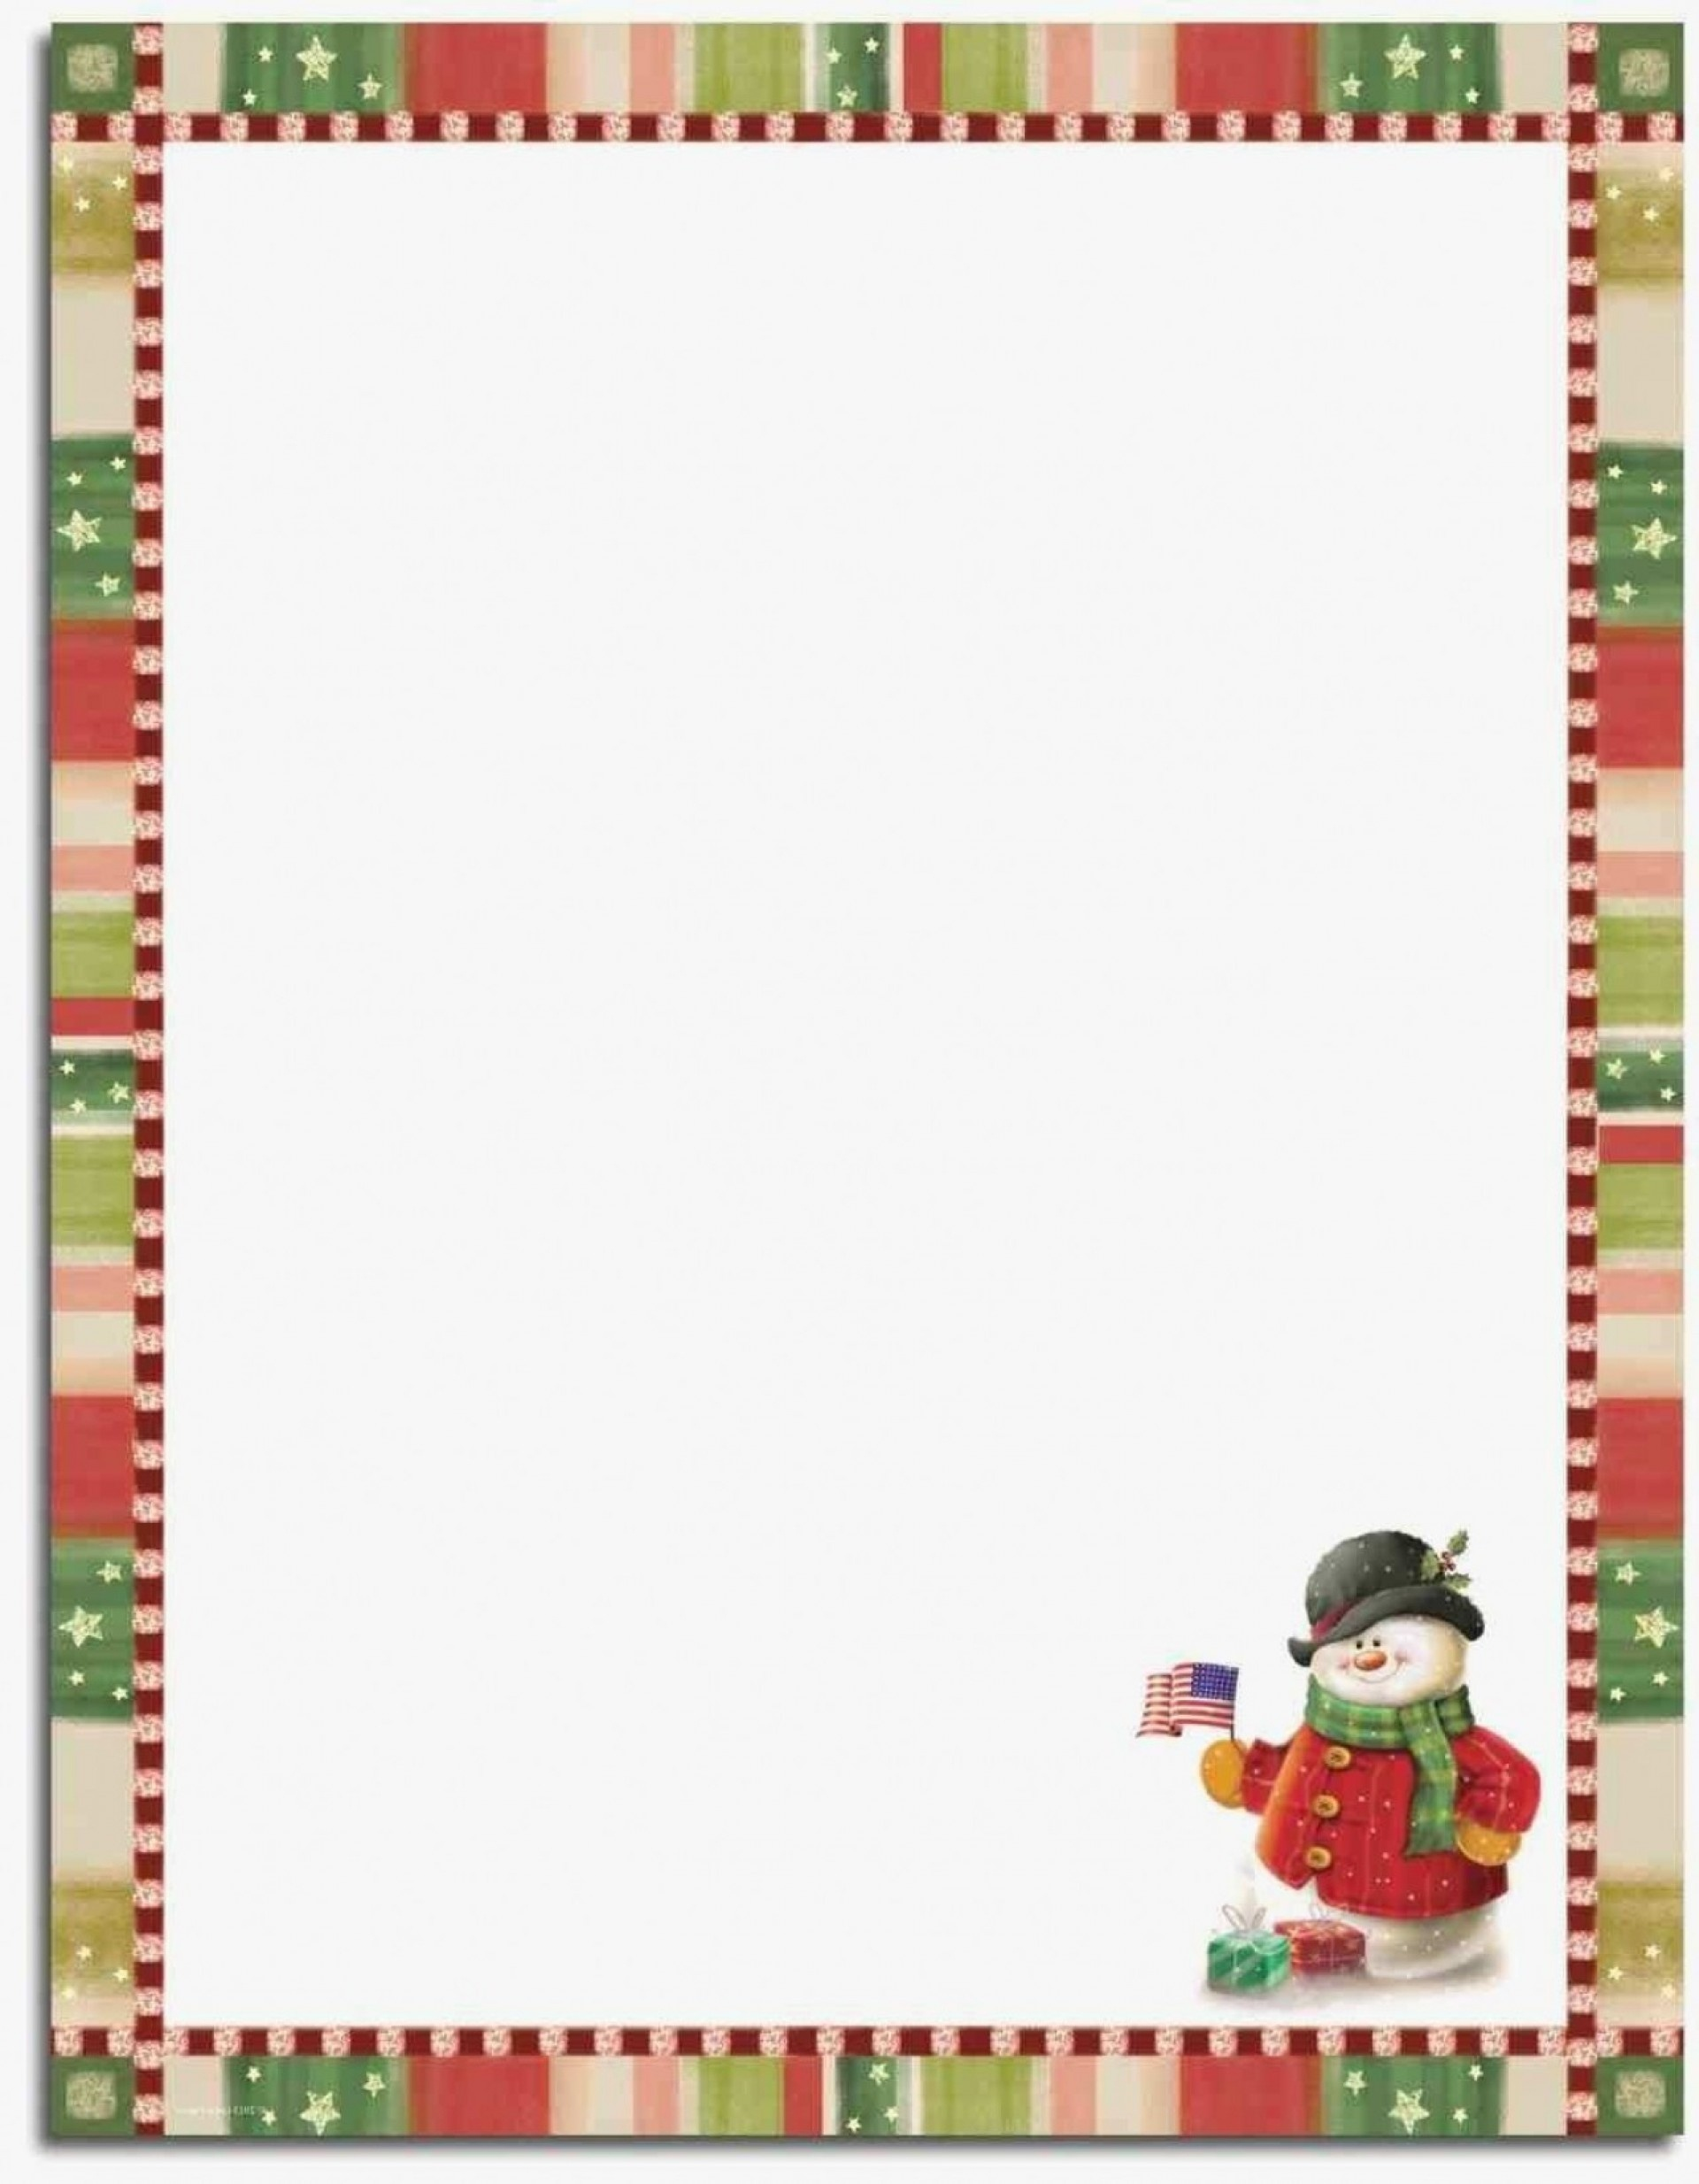 014 Template Ideas Free Printable Elegant Stationery Templates - Free Printable Snowman Stationery